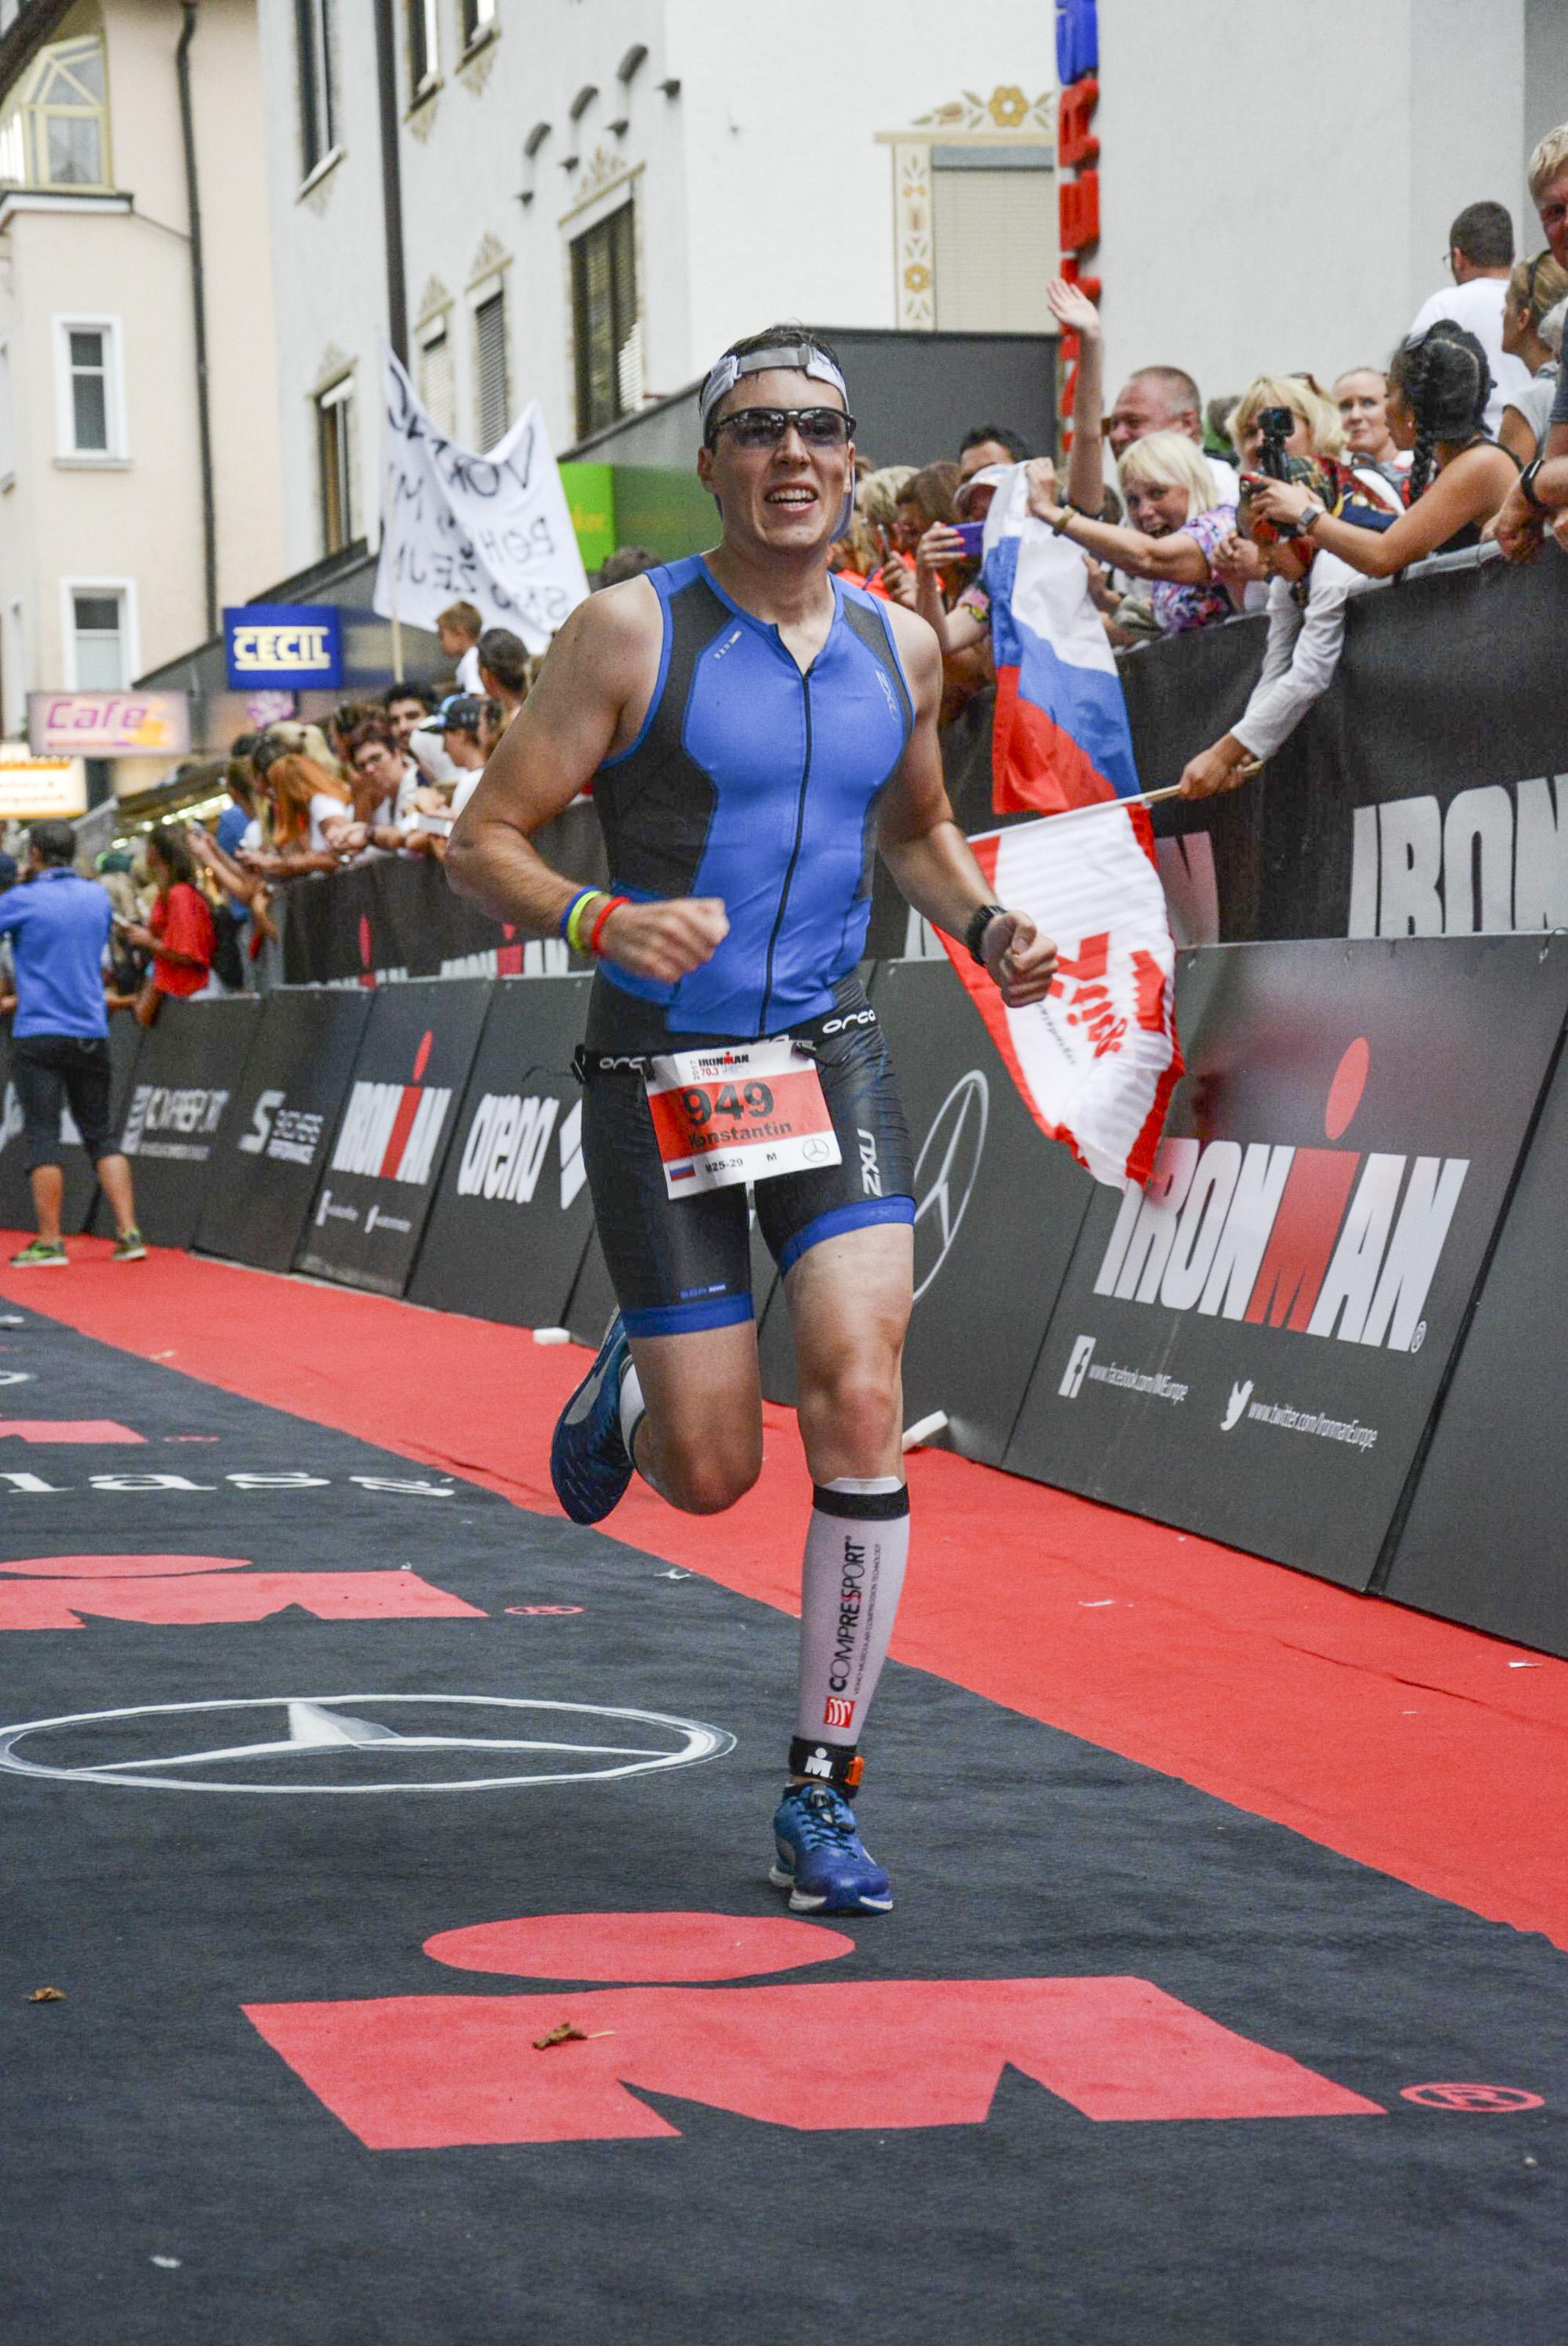 Финишная прямая на Ironman 70.3 Zell am See